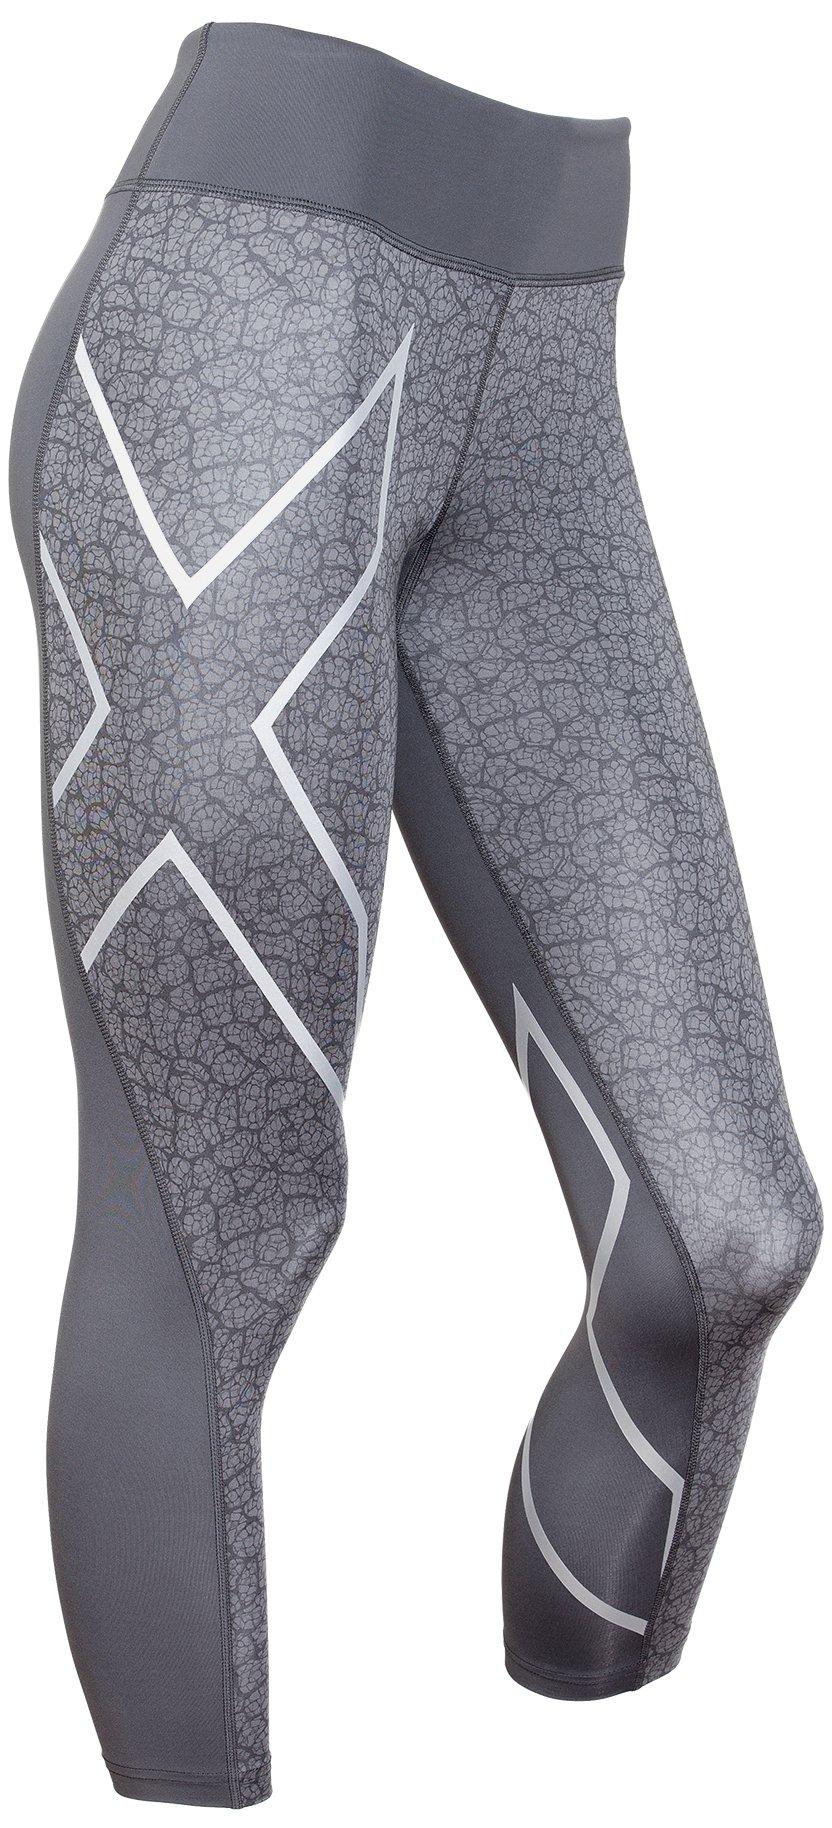 2XU Women's Mid-Rise 7/8 Compression Tights, Dark Slate/Bone Print, Large by 2XU (Image #1)